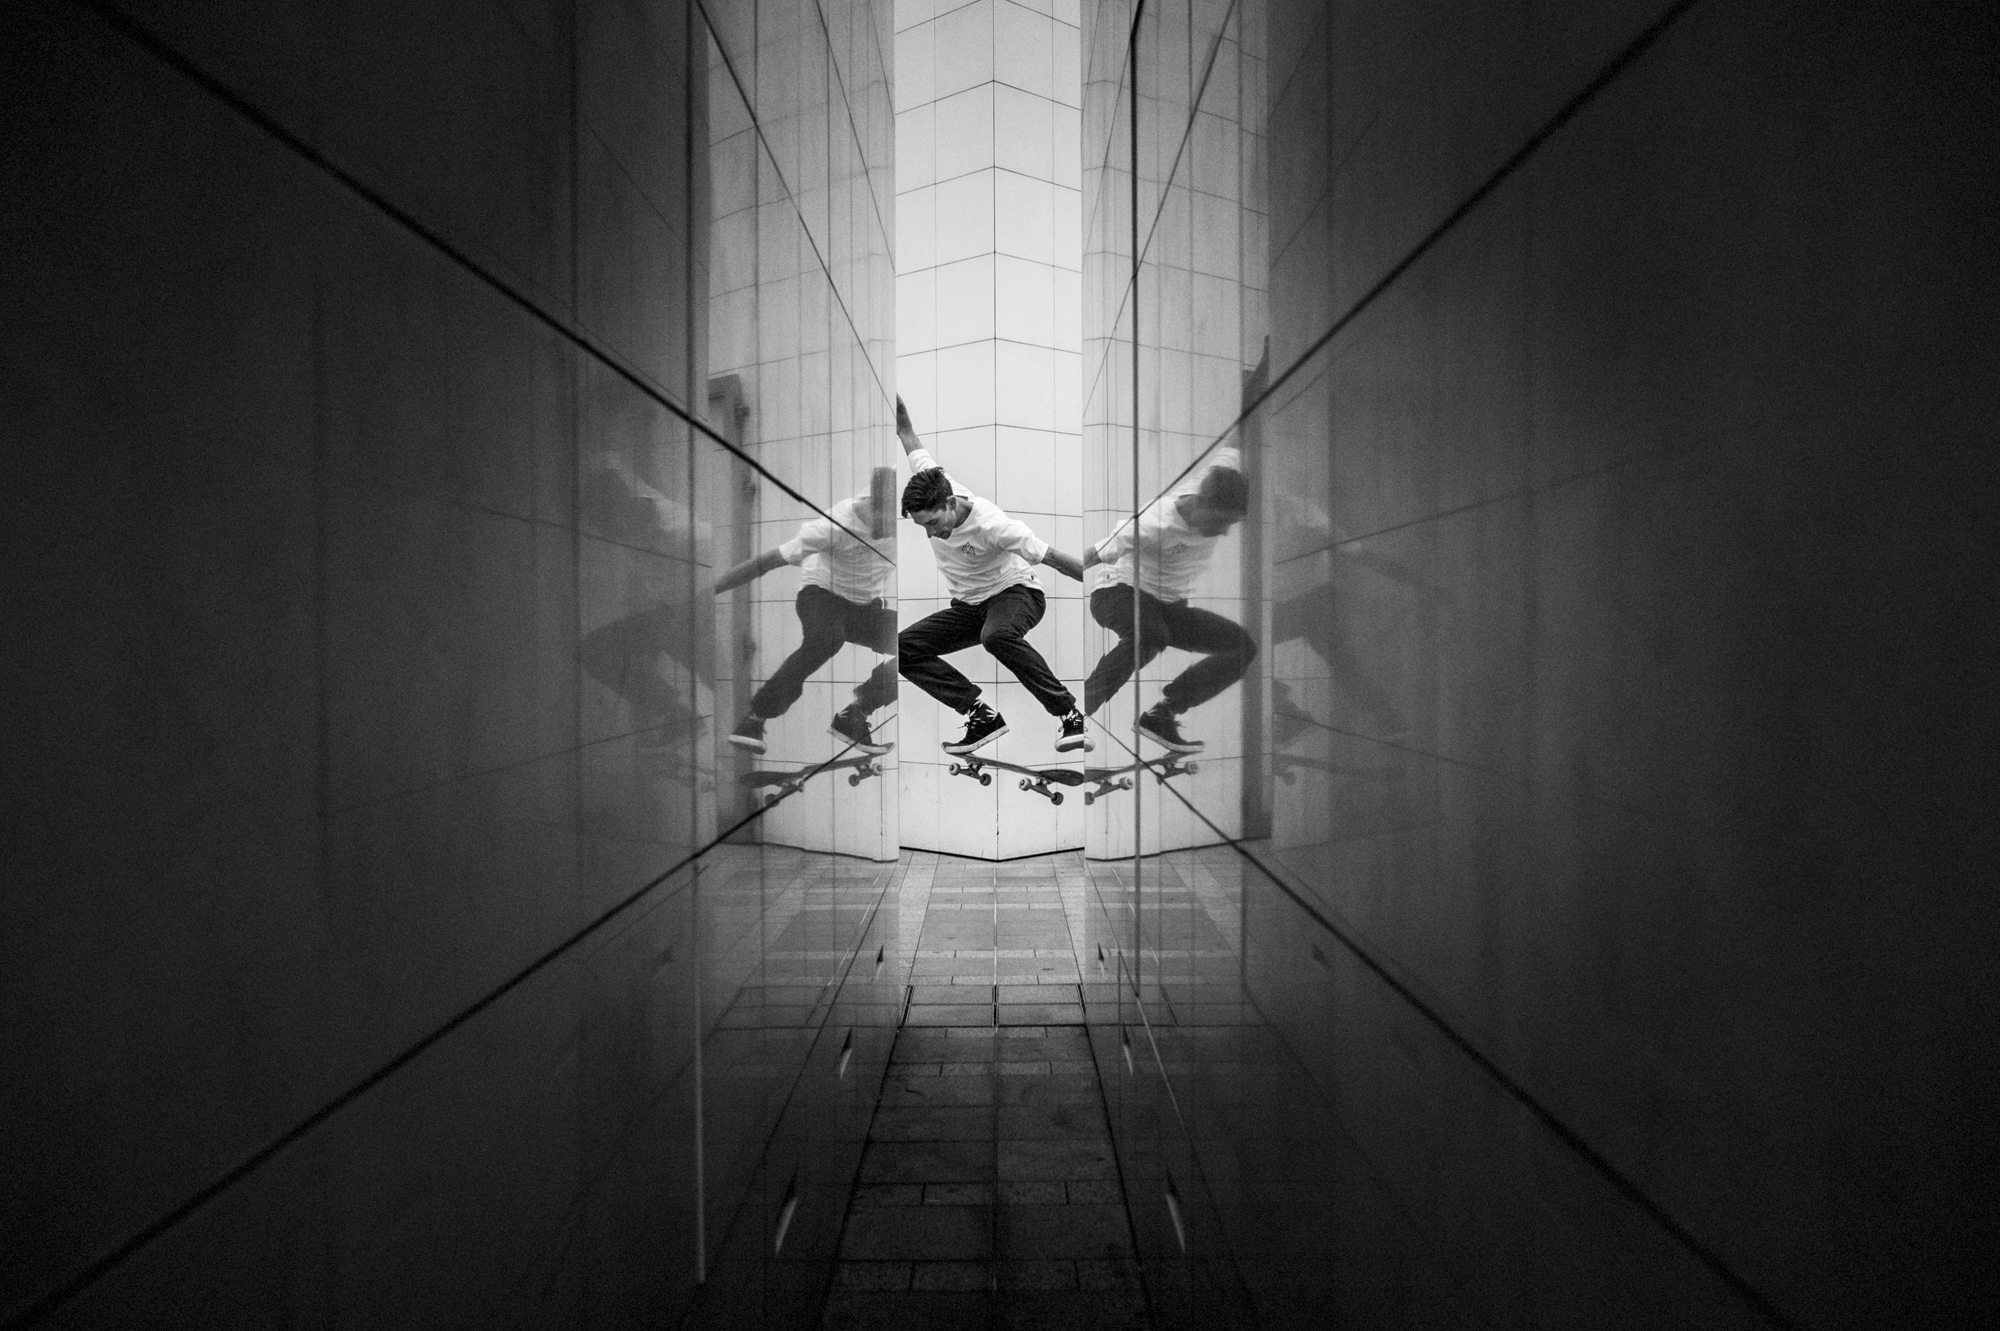 Beautiful Monochrome Skate Photographs